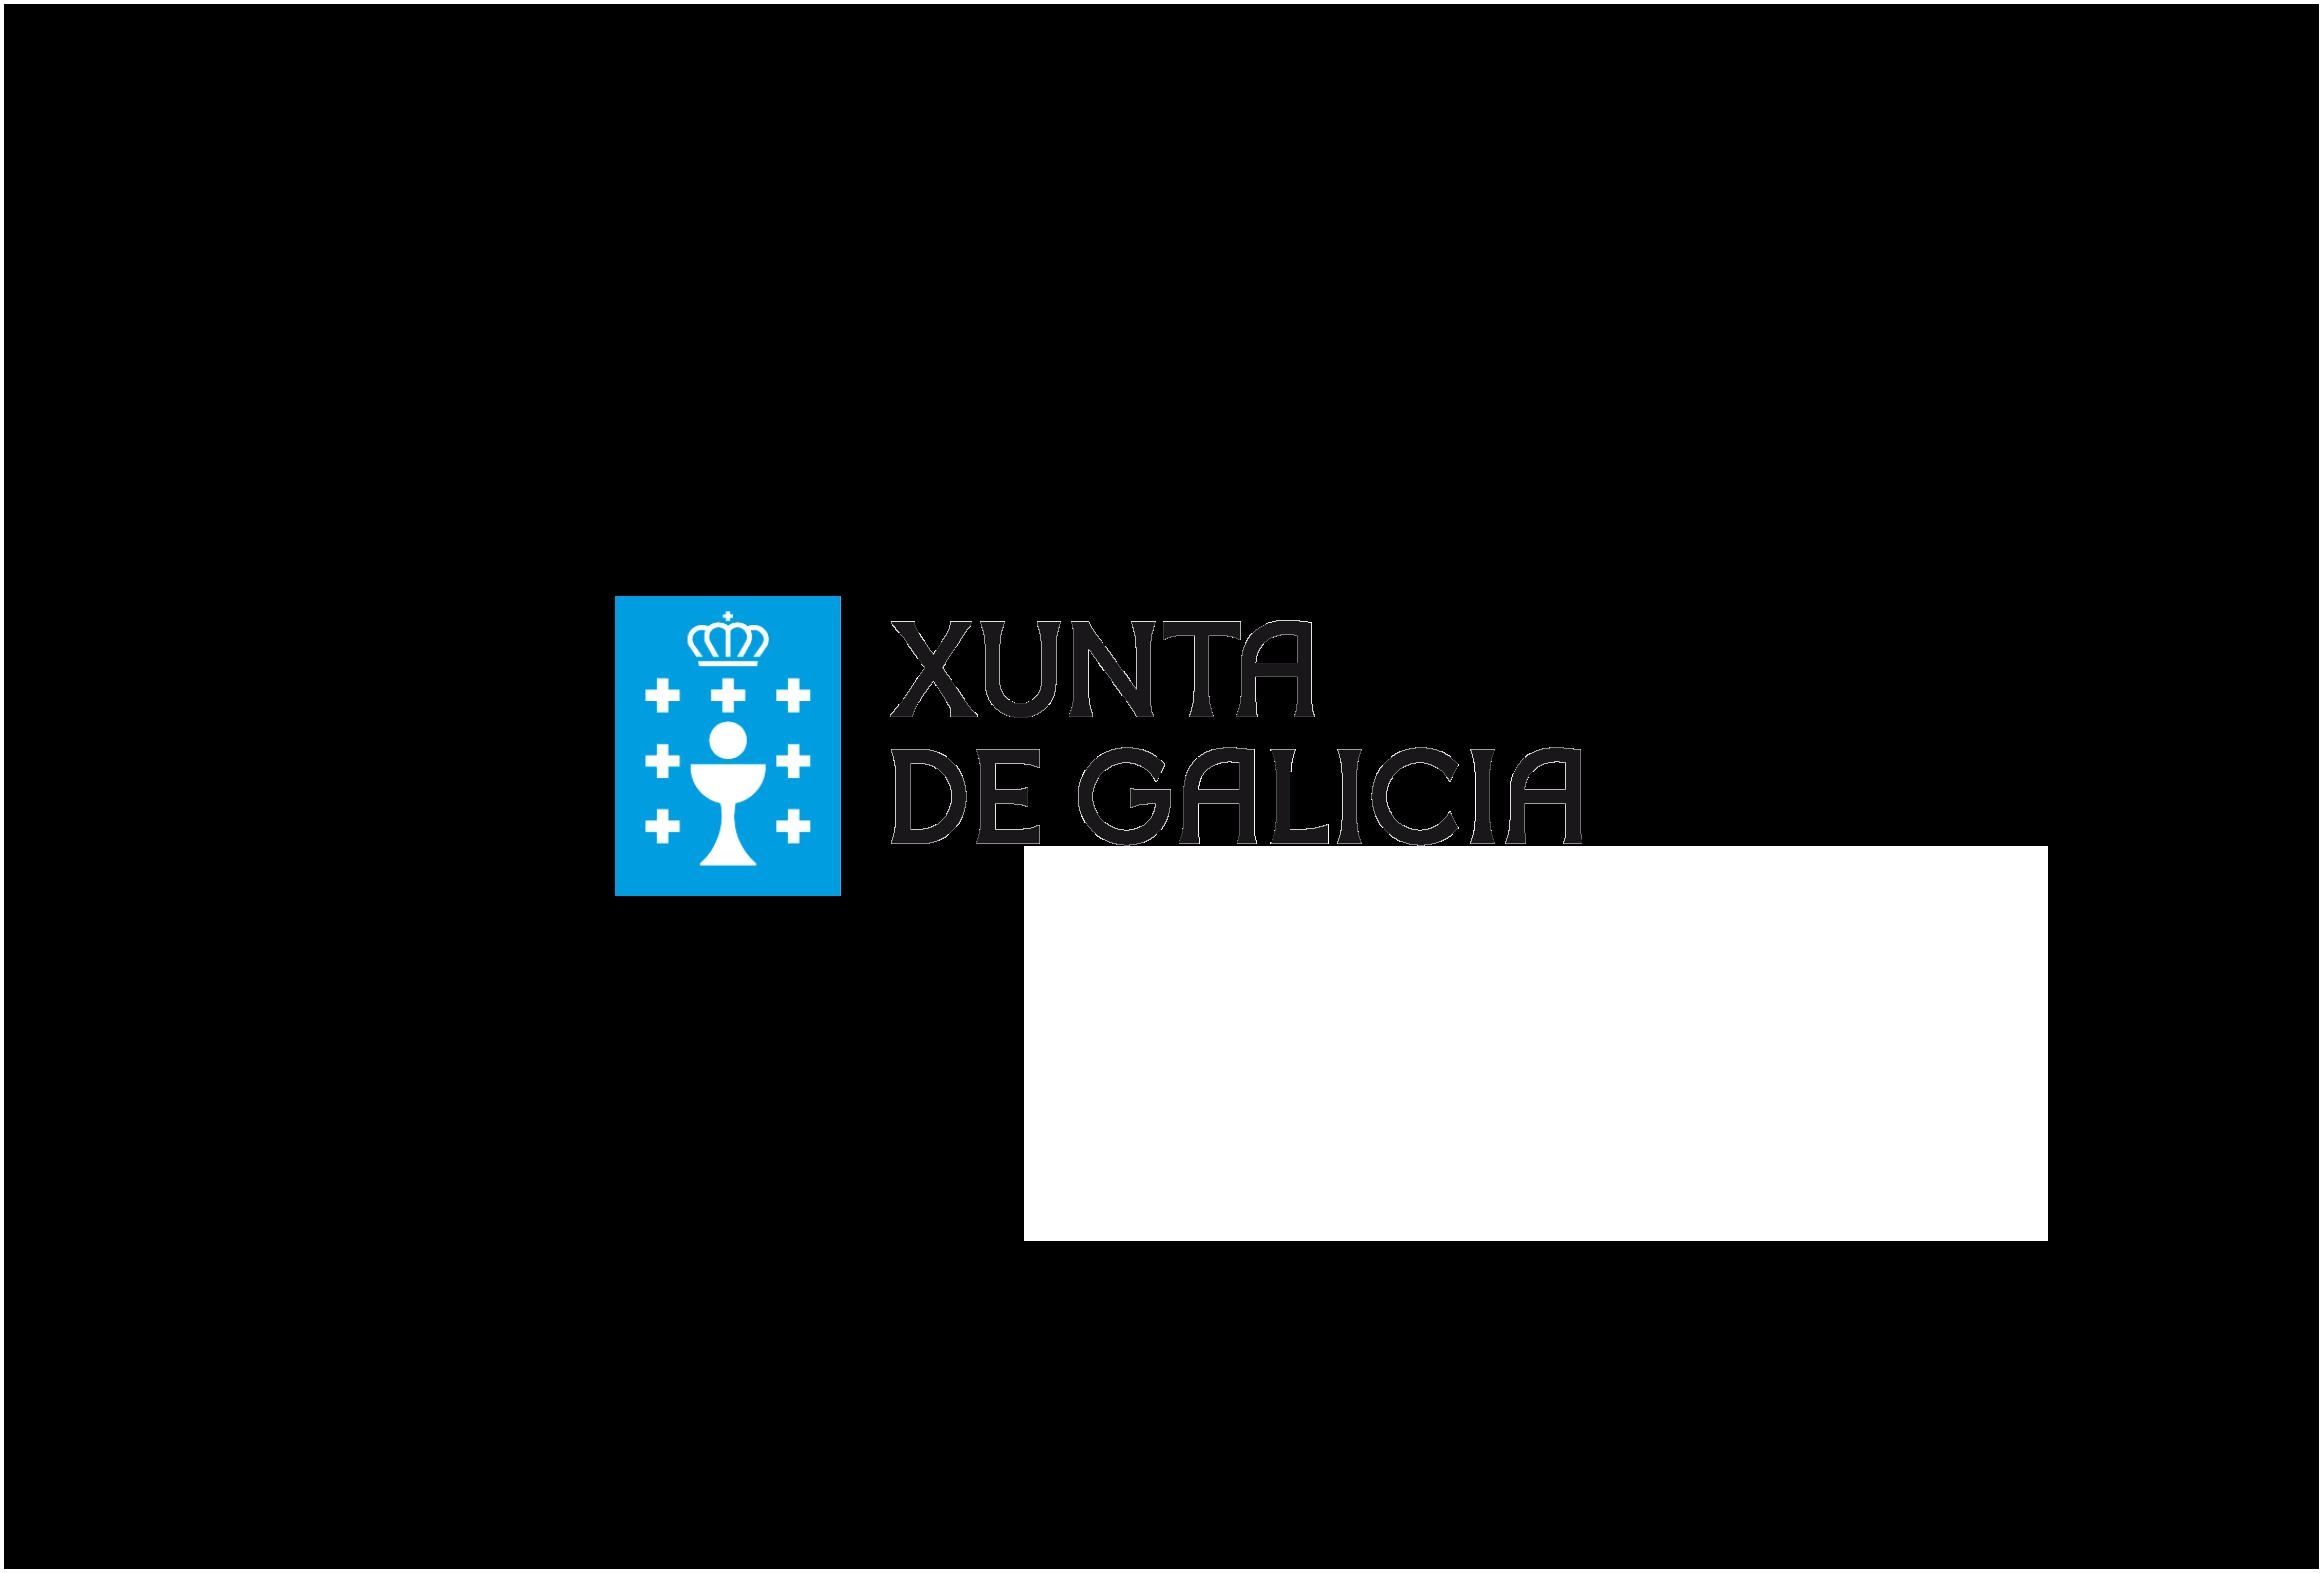 Proyecto cofinanciado Xunta de Galicia